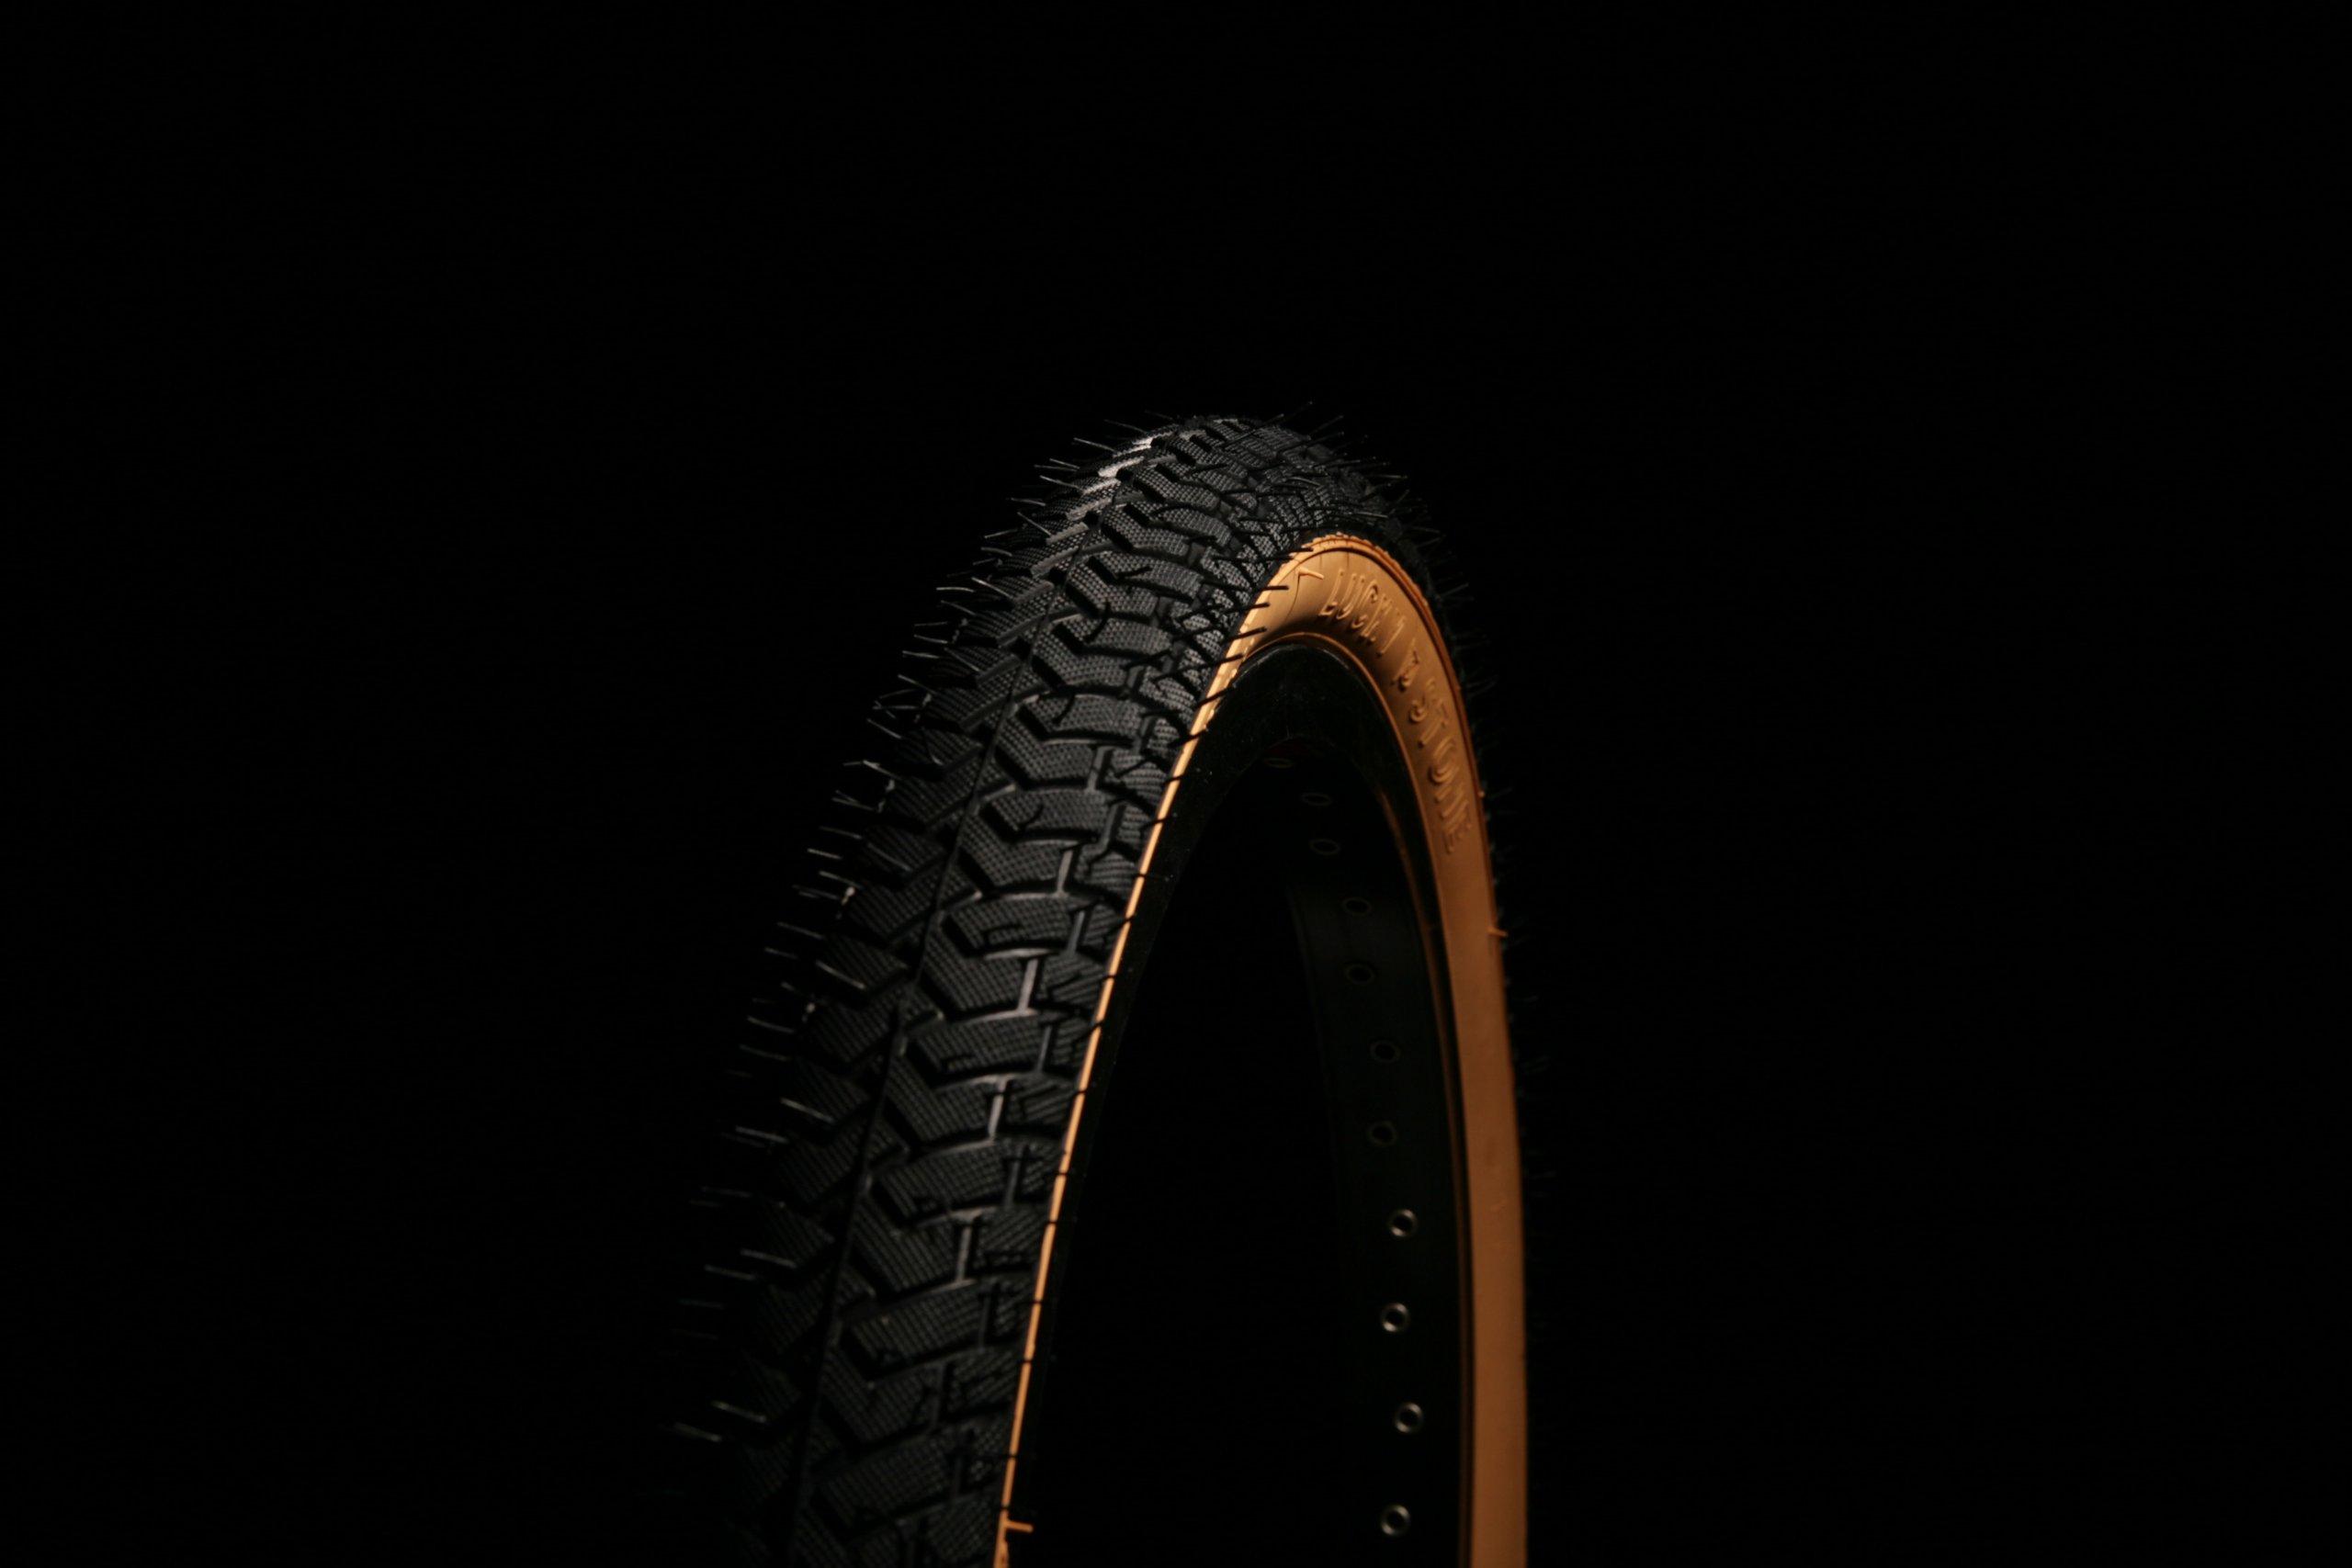 CURIO UK BLACK BLUE WALL BMX TYRE TIRE LS214 20 X 2.125 RAMP STREET THREAD